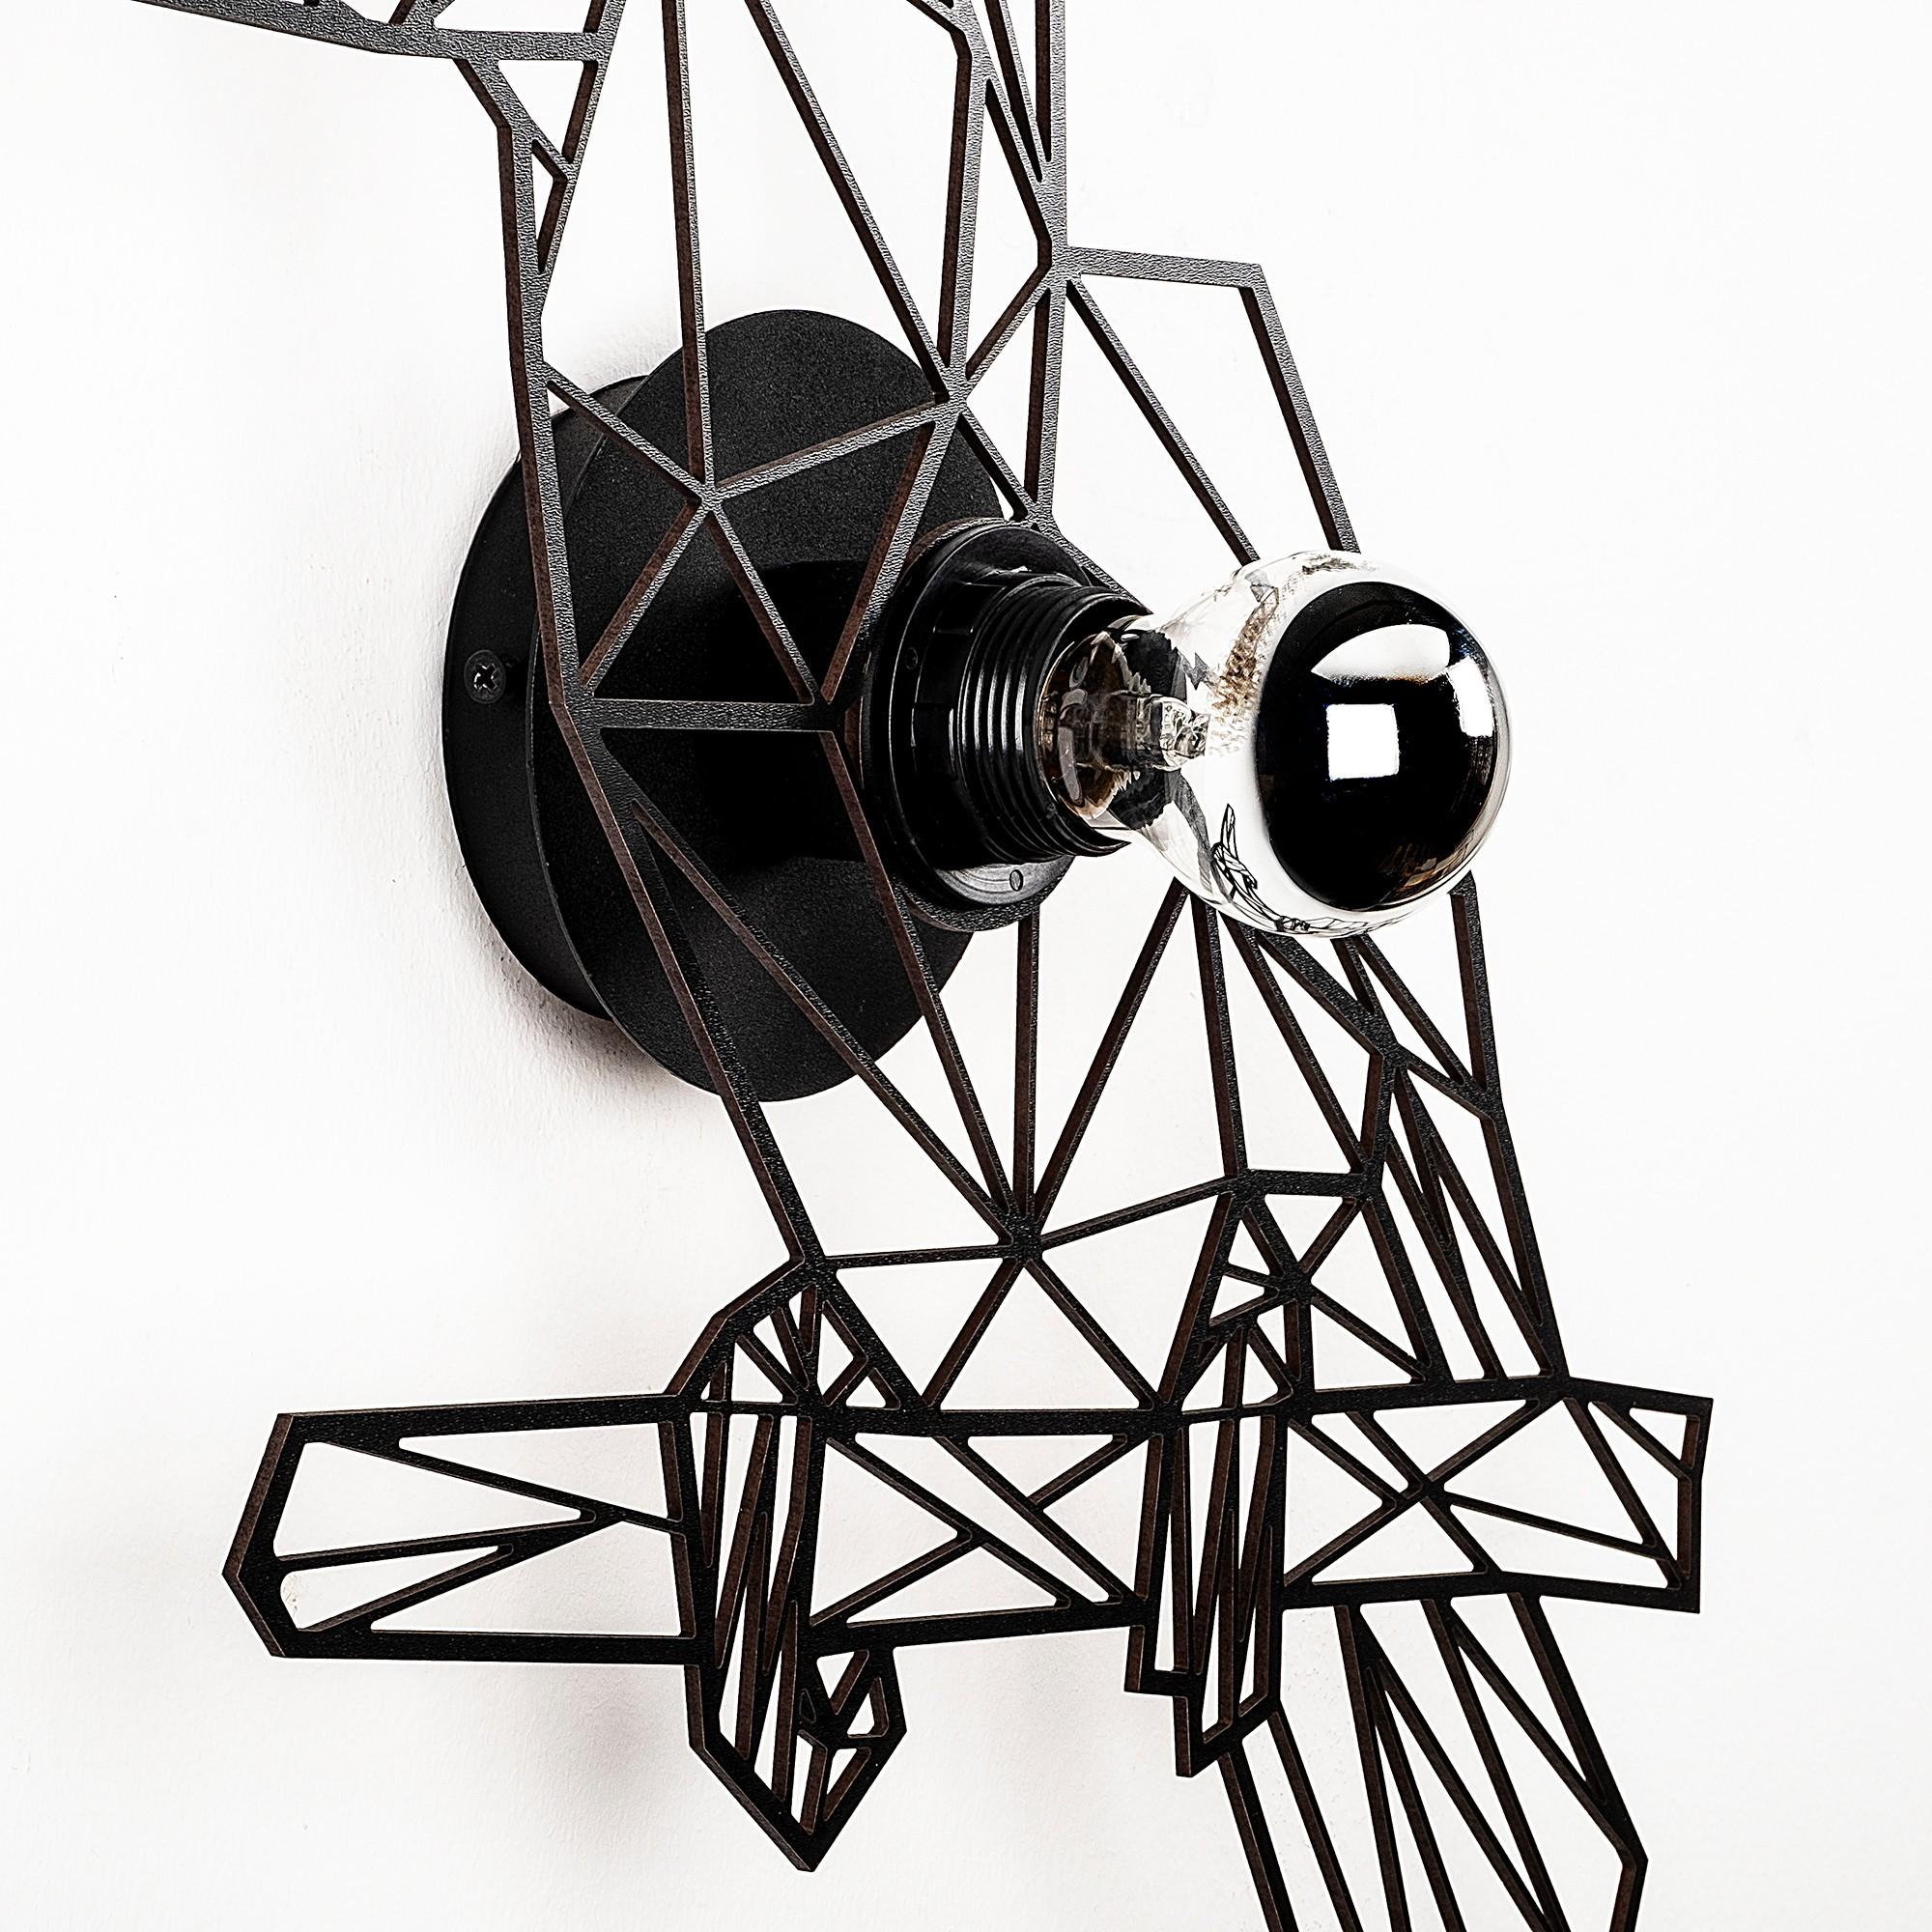 LED industriële wanddeco lamp dieren - Toekan - dimbaar - E27 fitting - close up